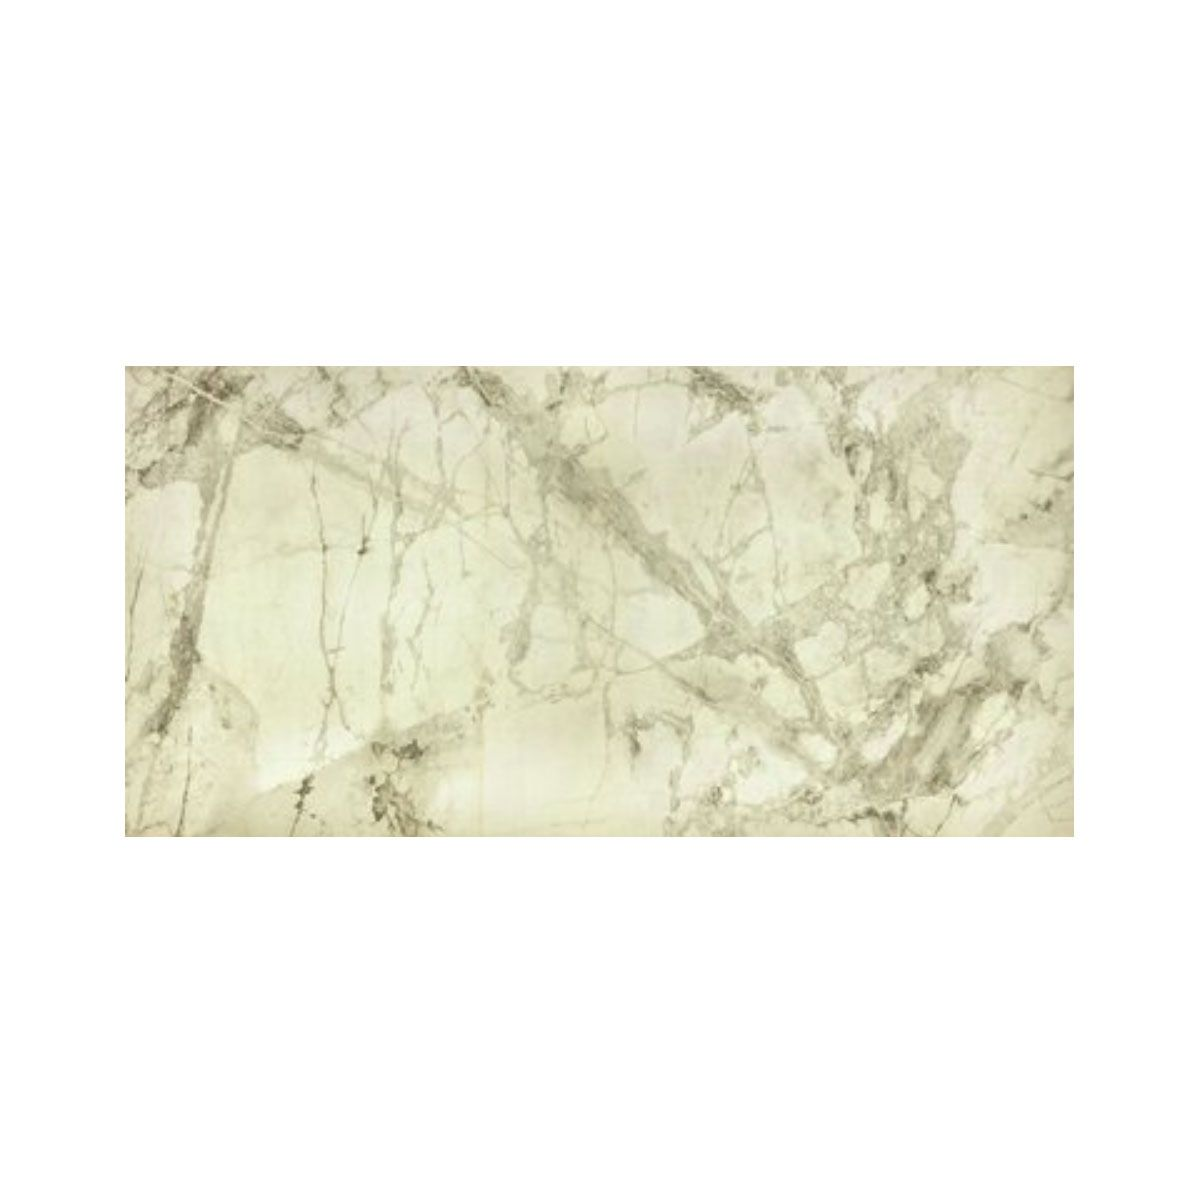 RAK Luce Translucent Marble White Full Lappato Tile 1200 x 2600mm